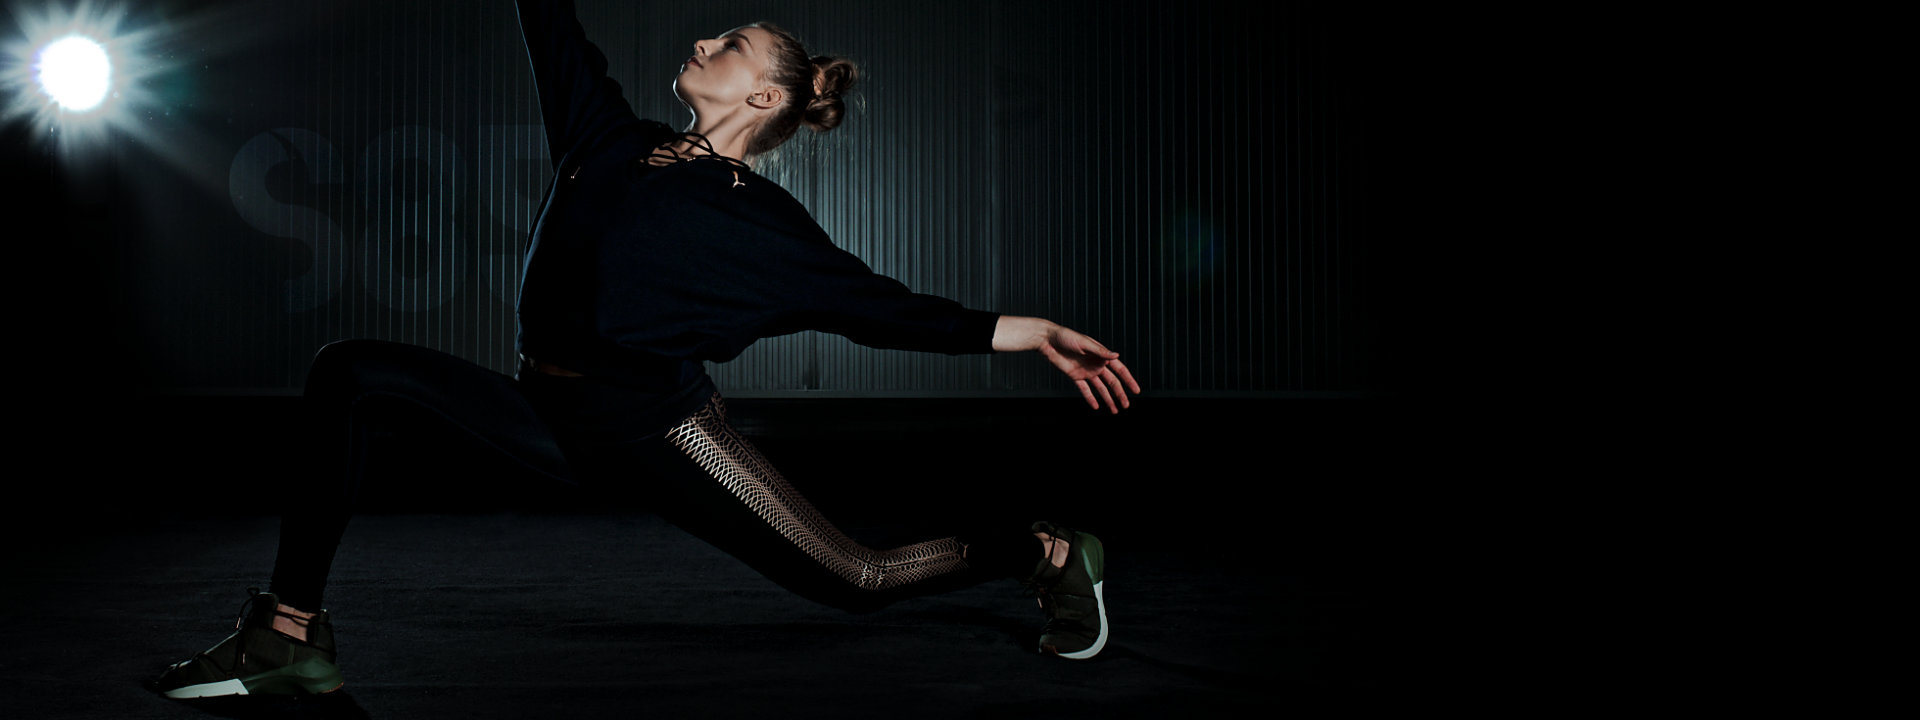 Woman active wear